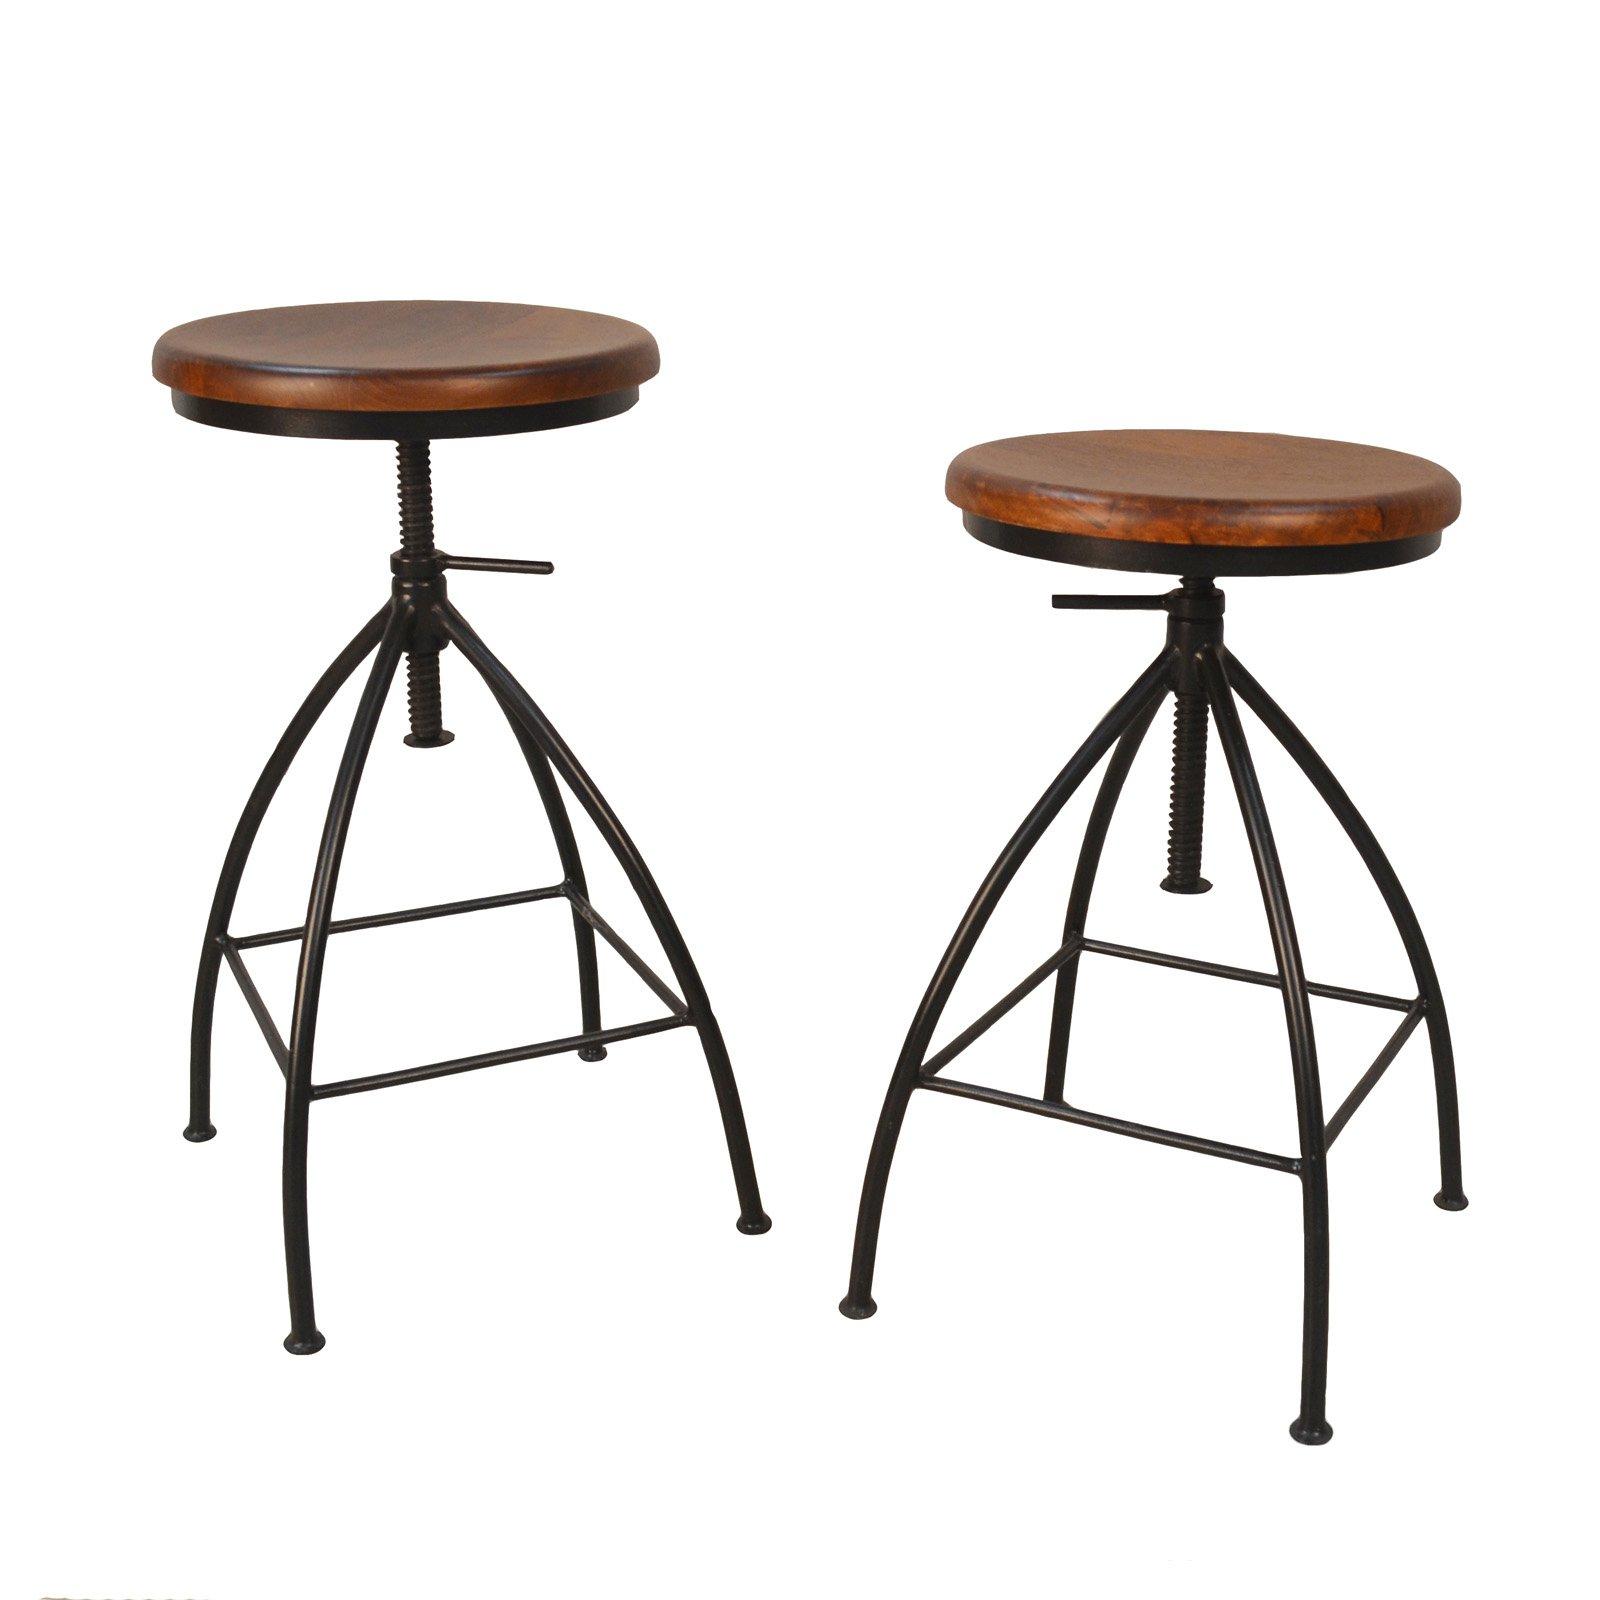 Enjoyable Carolina Chair Table Co Ian Adjustable Bar Stool Set Of Caraccident5 Cool Chair Designs And Ideas Caraccident5Info